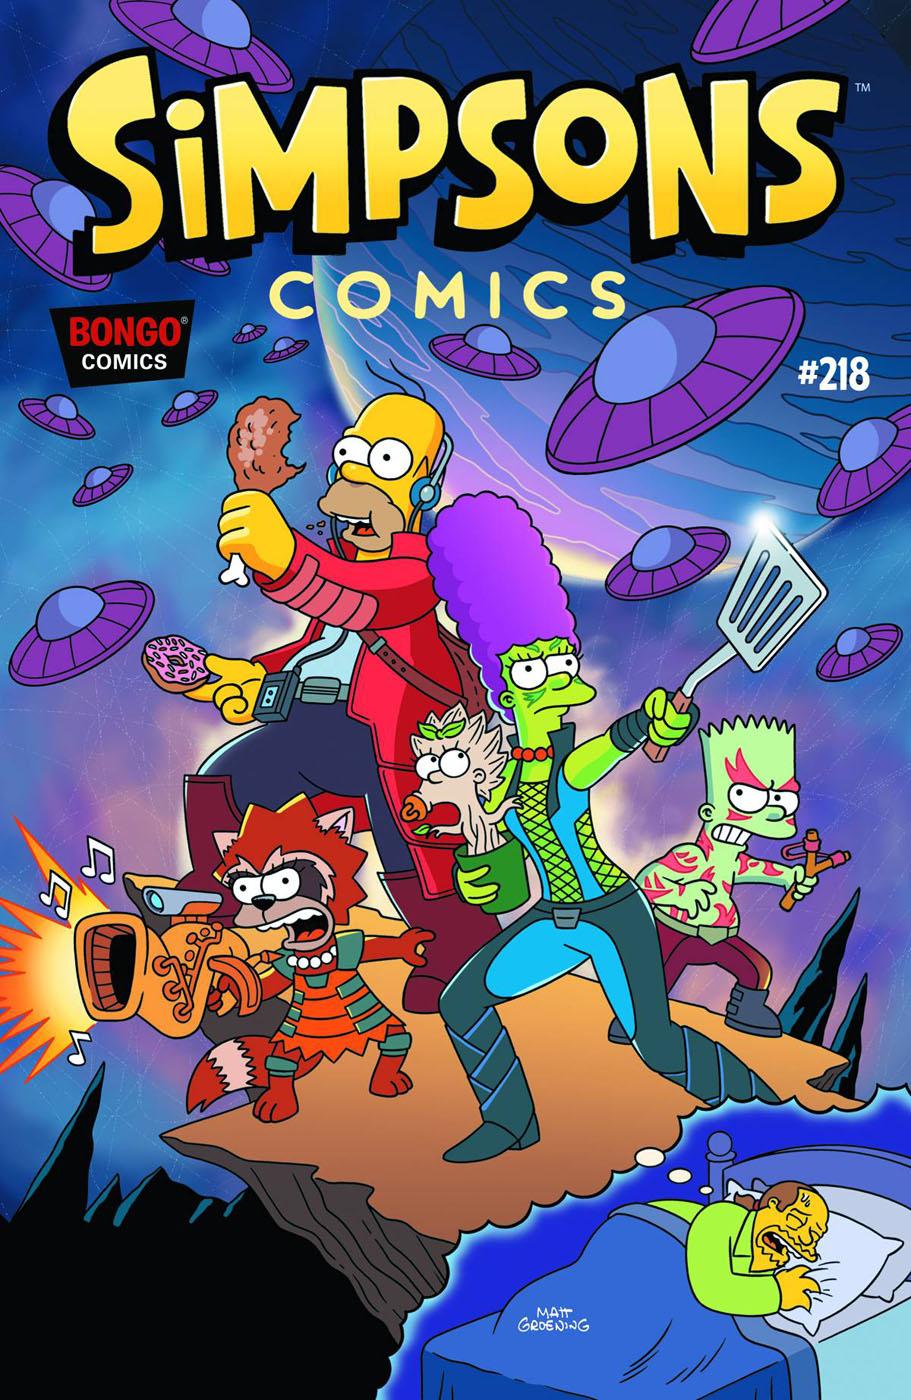 Simpsons Comics 218   Simpsons Wiki   FANDOM powered by Wikia